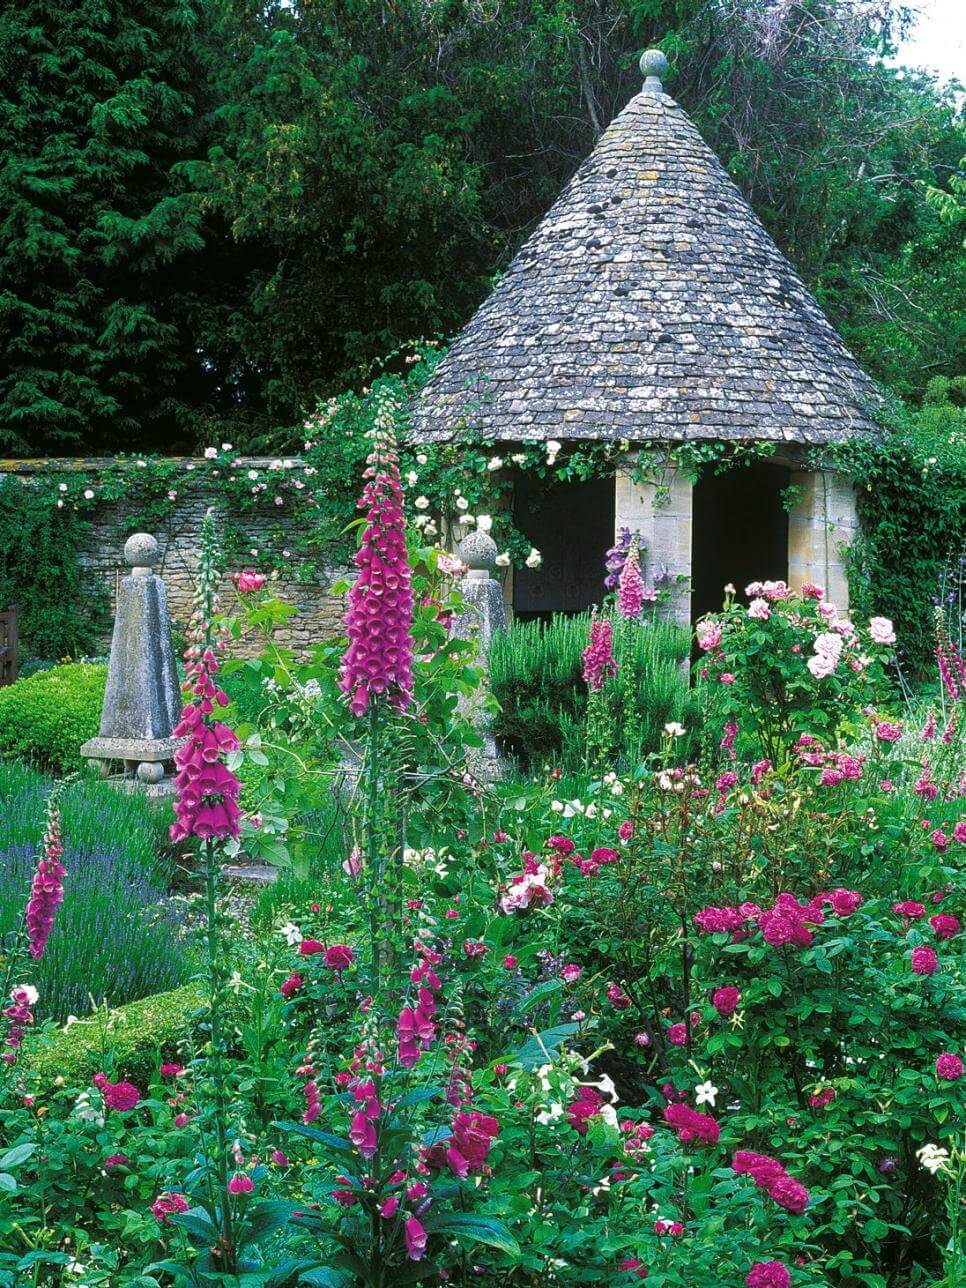 Fantasy Gazebo with Wild Gardens